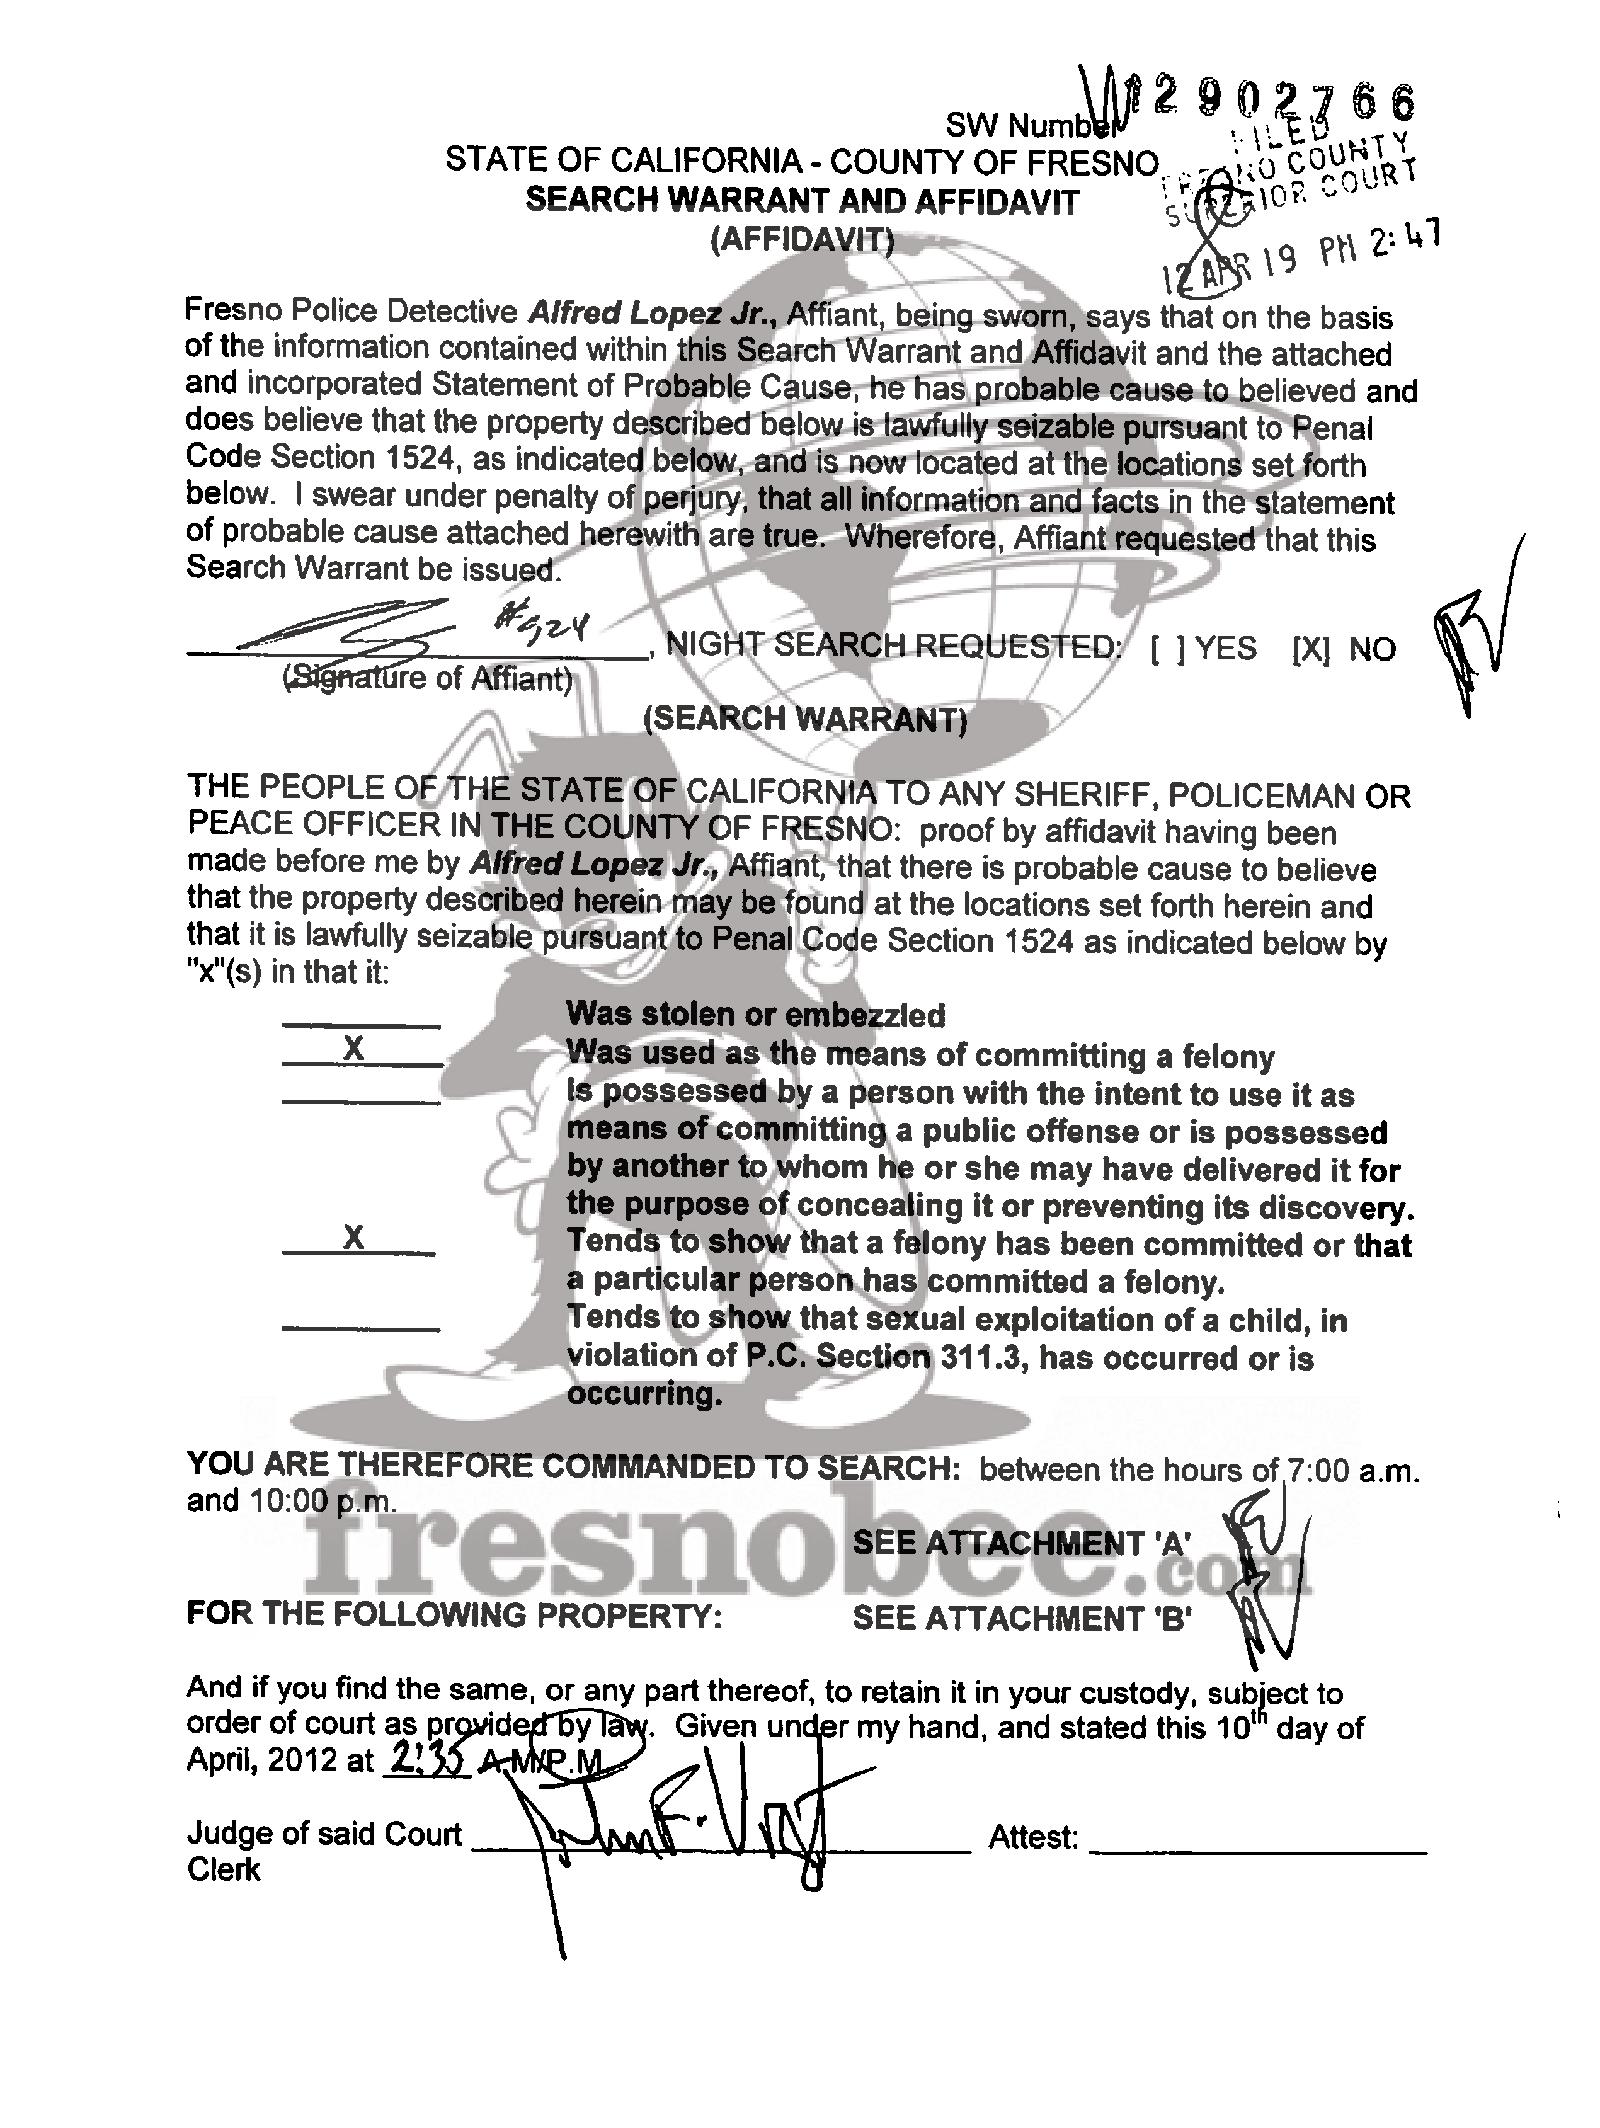 Copy of denman megan search warrant affidavit1.png